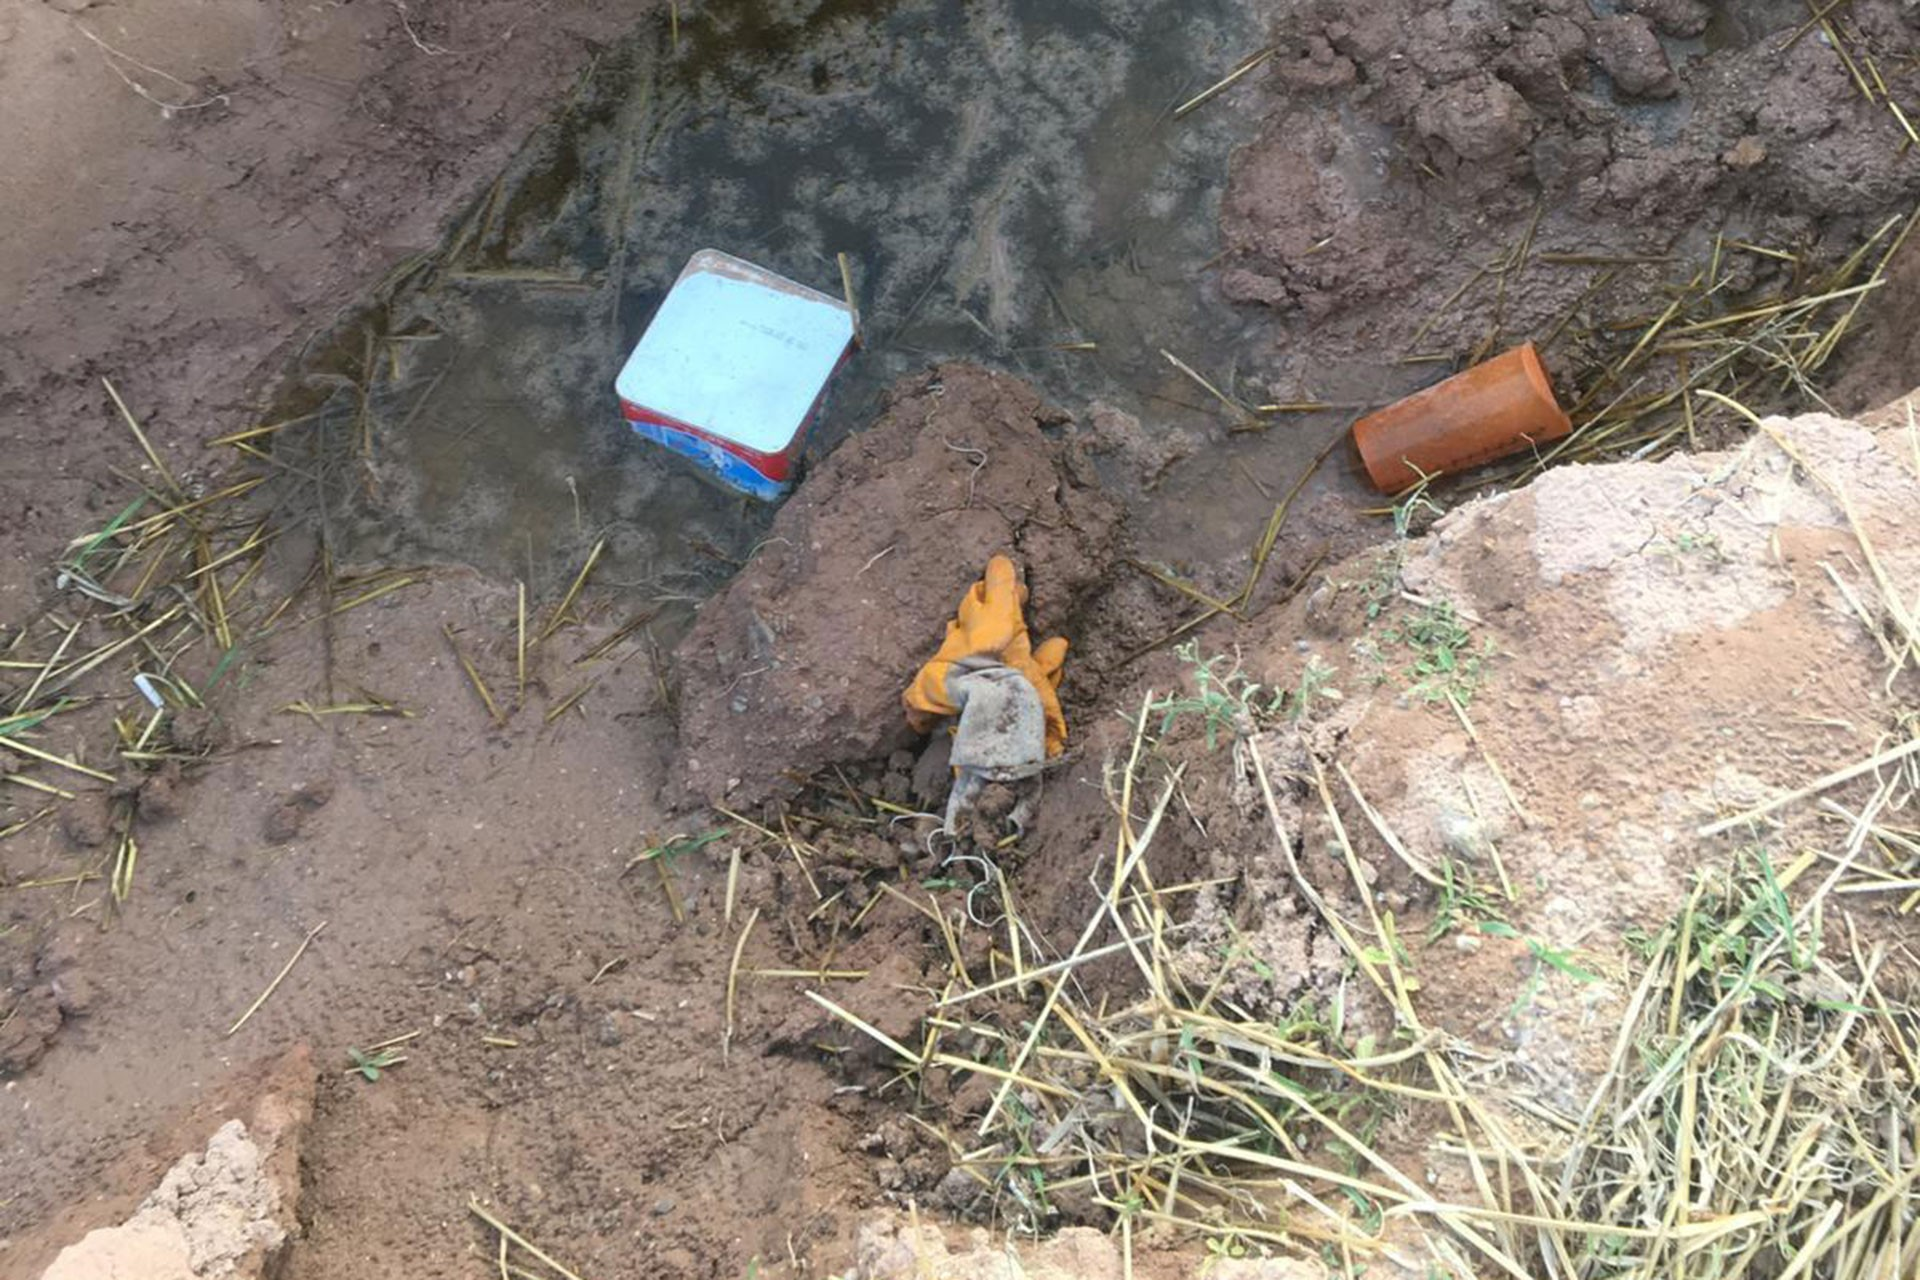 Tepeköy'deki madenin atık havuzundan sızan siyanürlü su